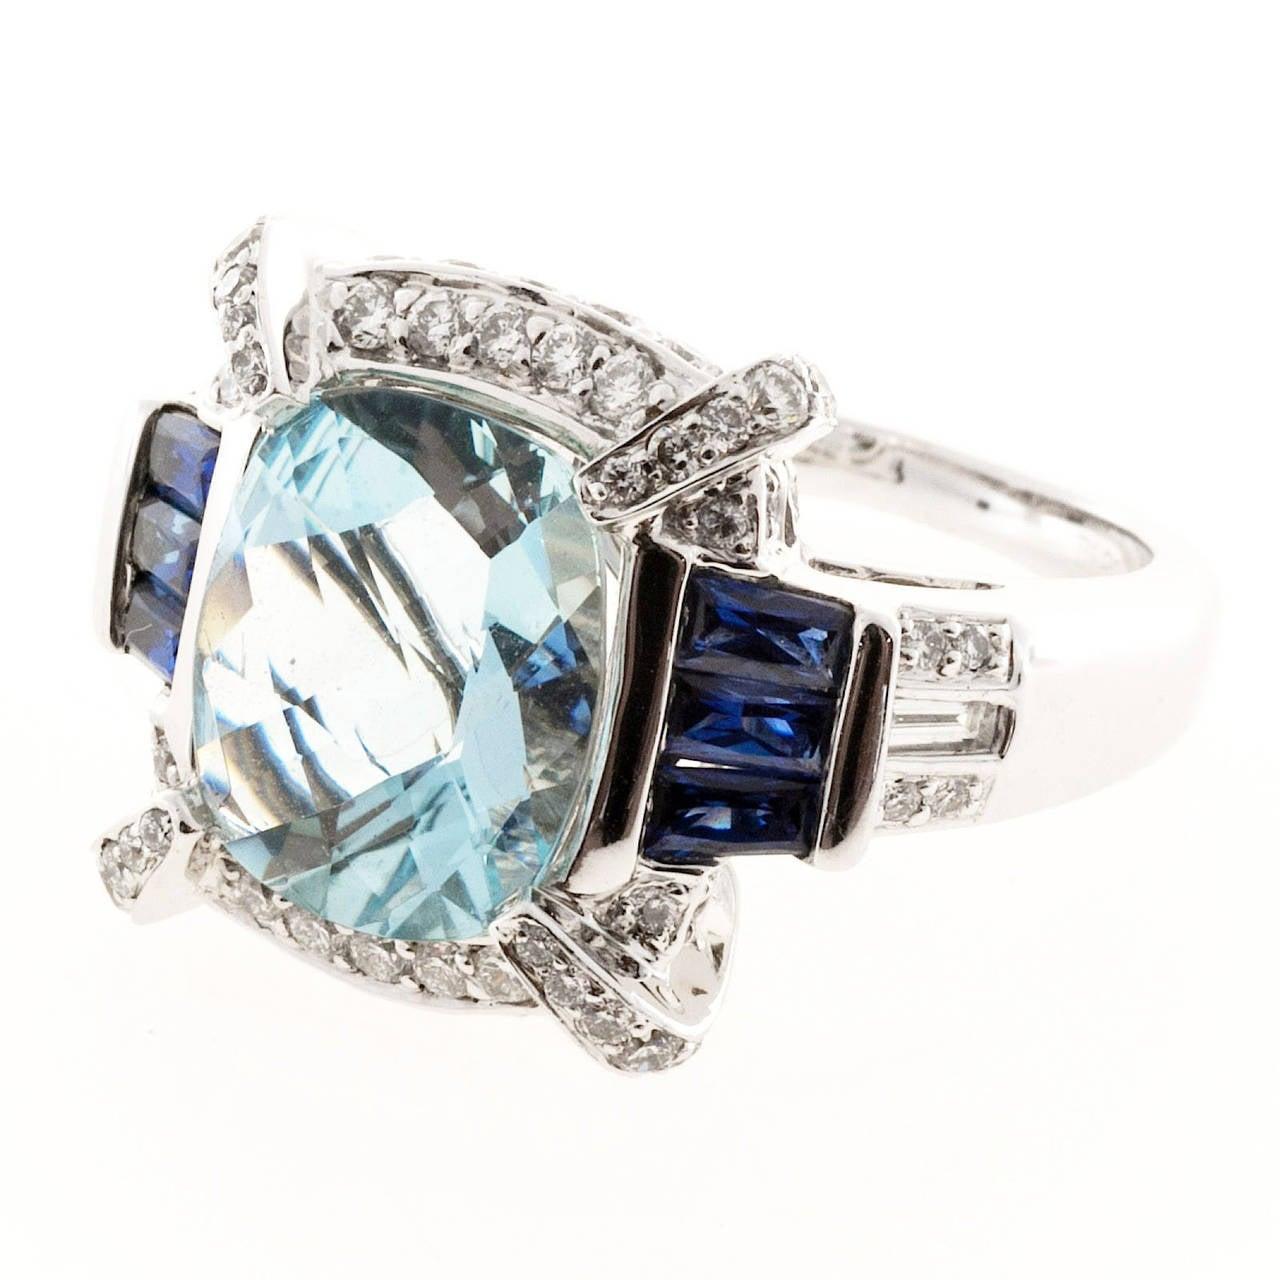 Charles Krypell Aquamarine Sapphire Diamond Gold Cocktail Ring 2